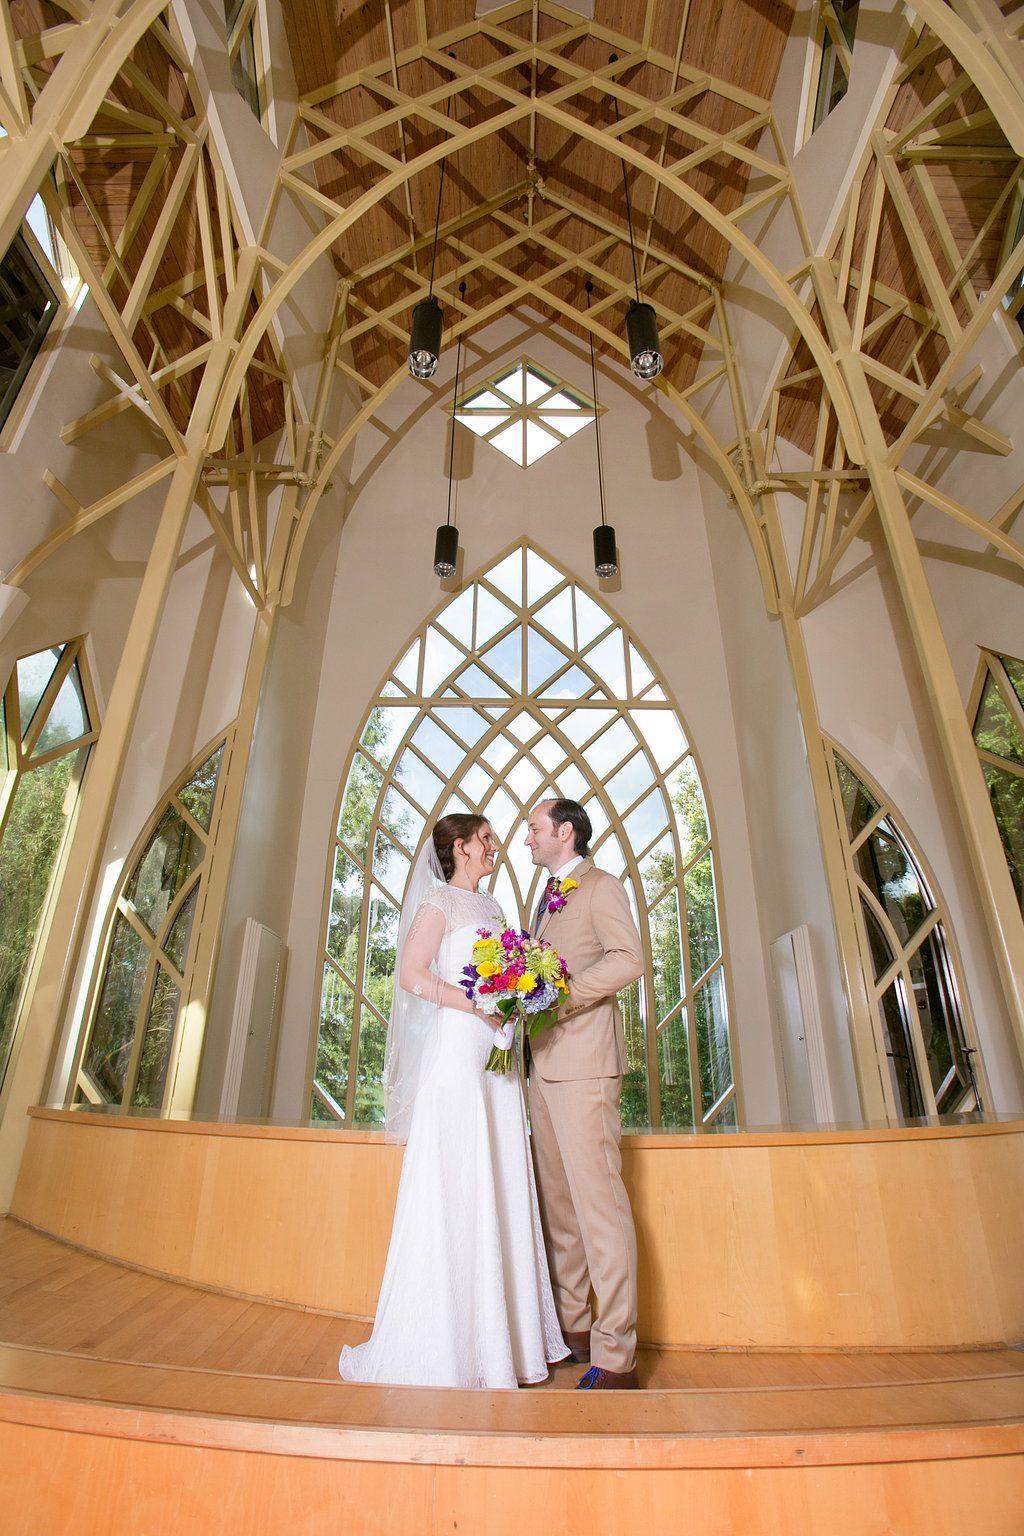 Wedding At The Baughman Center Gainesville Fl Photo By Verve Studios Wedding Dresses Ball Gowns Wedding Wedding Dress Couture